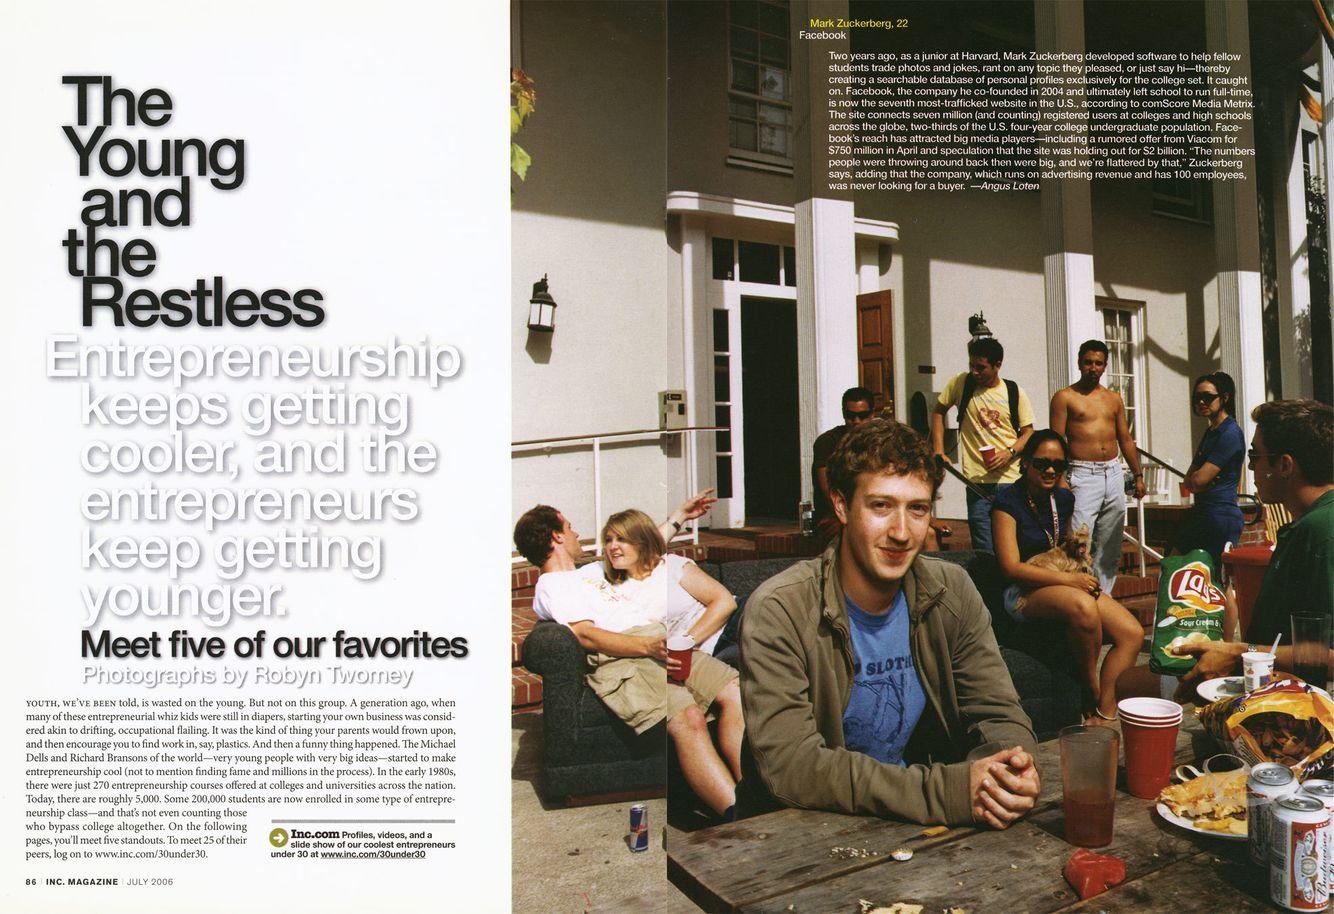 Mark Zuckerberg, Stanford University, Palo Alto, CA